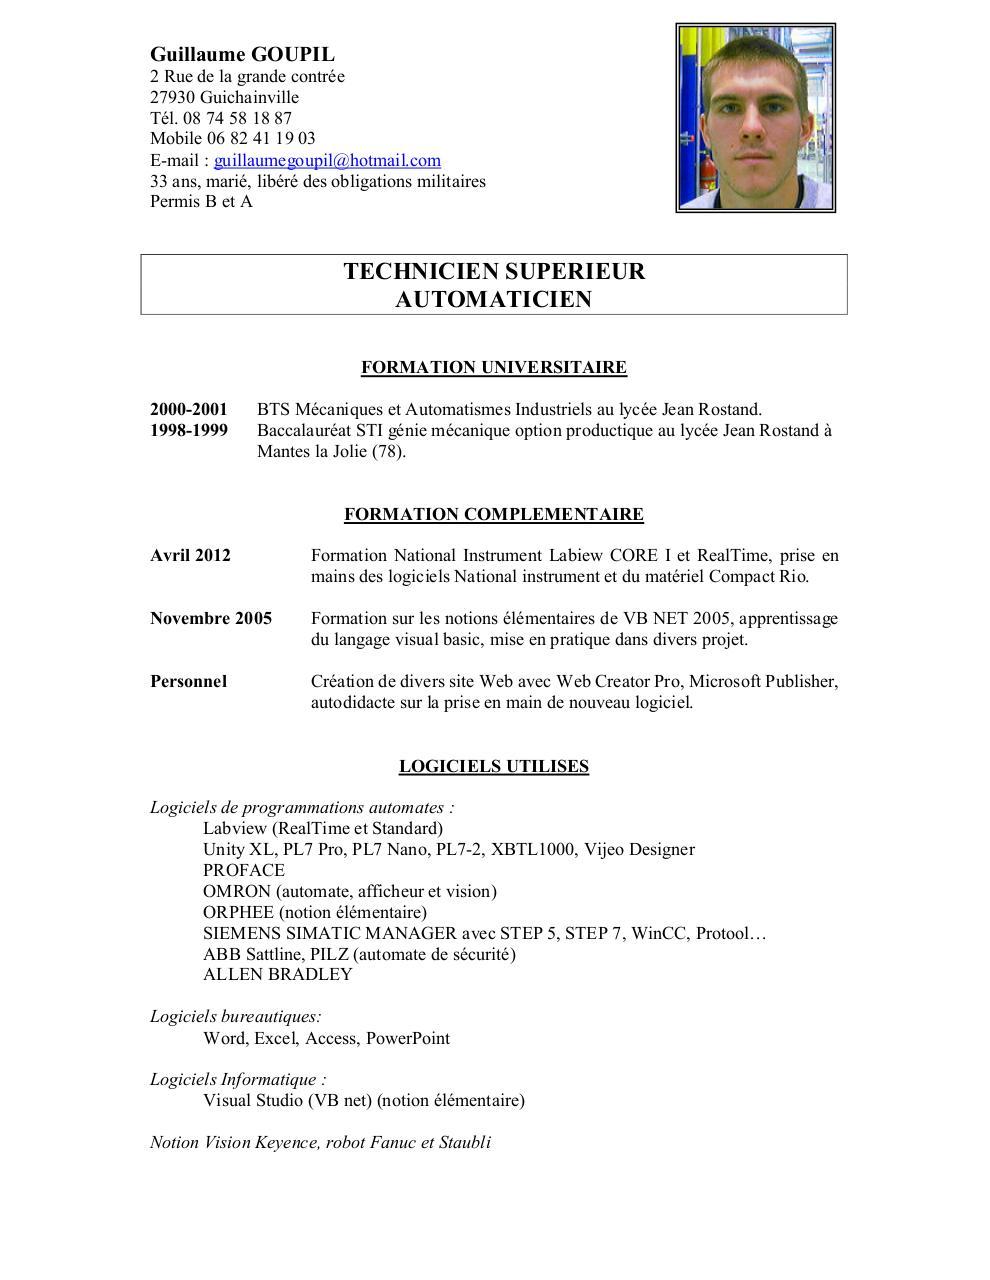 cv 2012 doc par guillaume